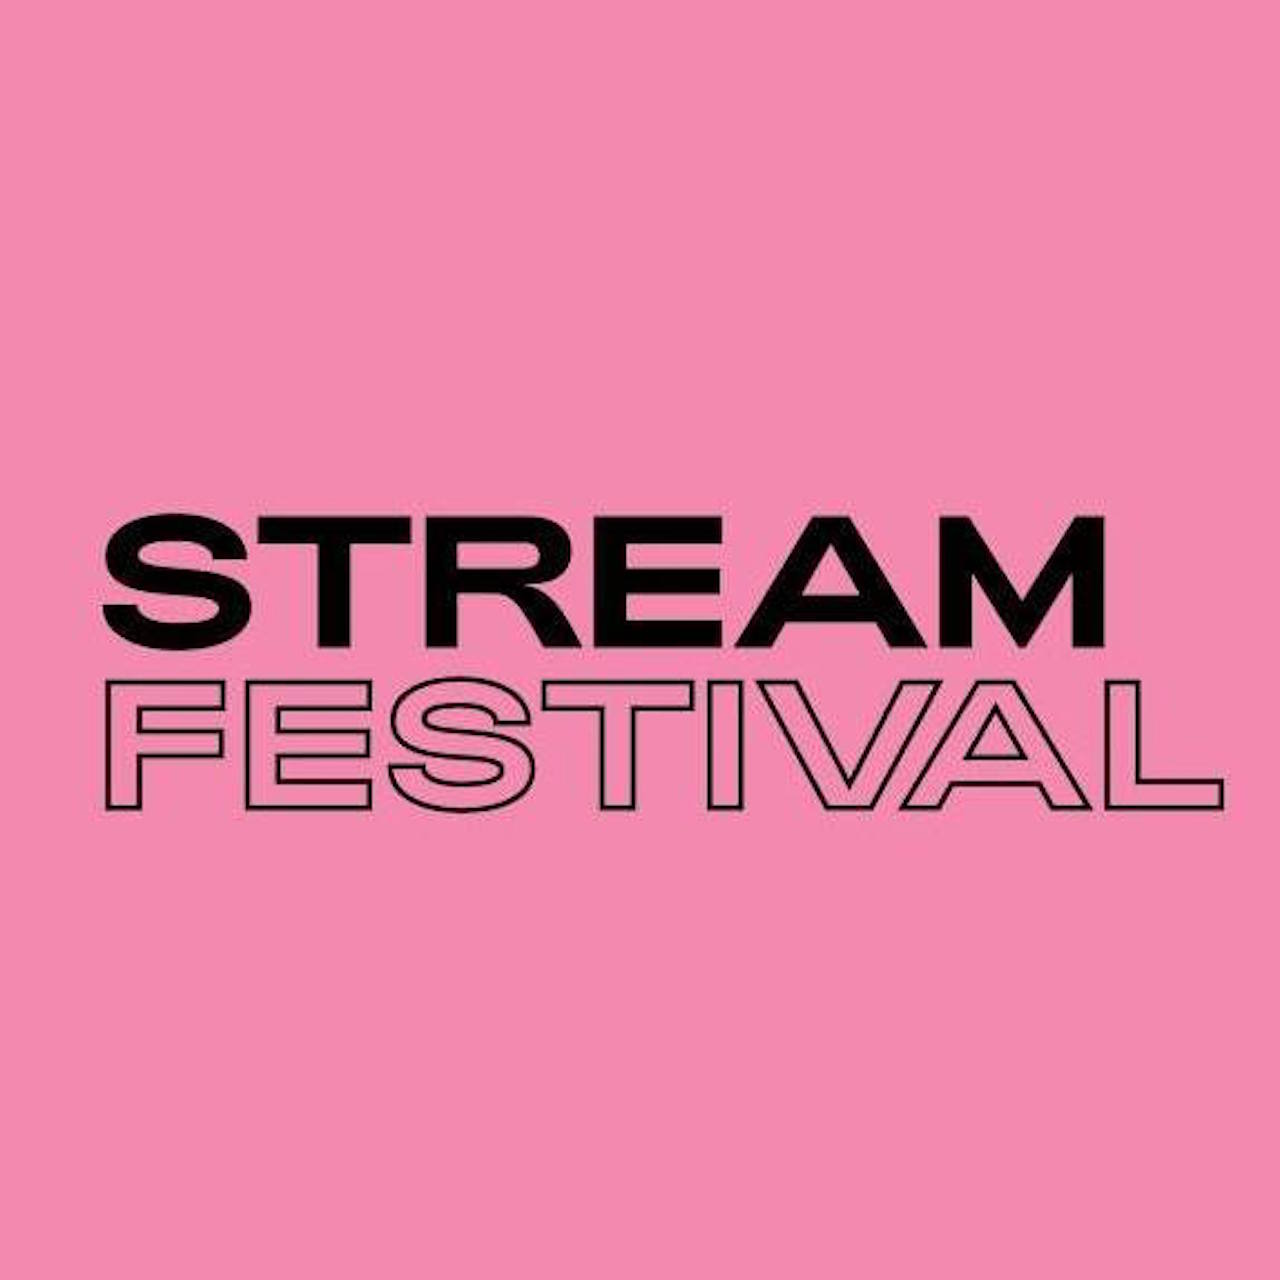 Stream Festival